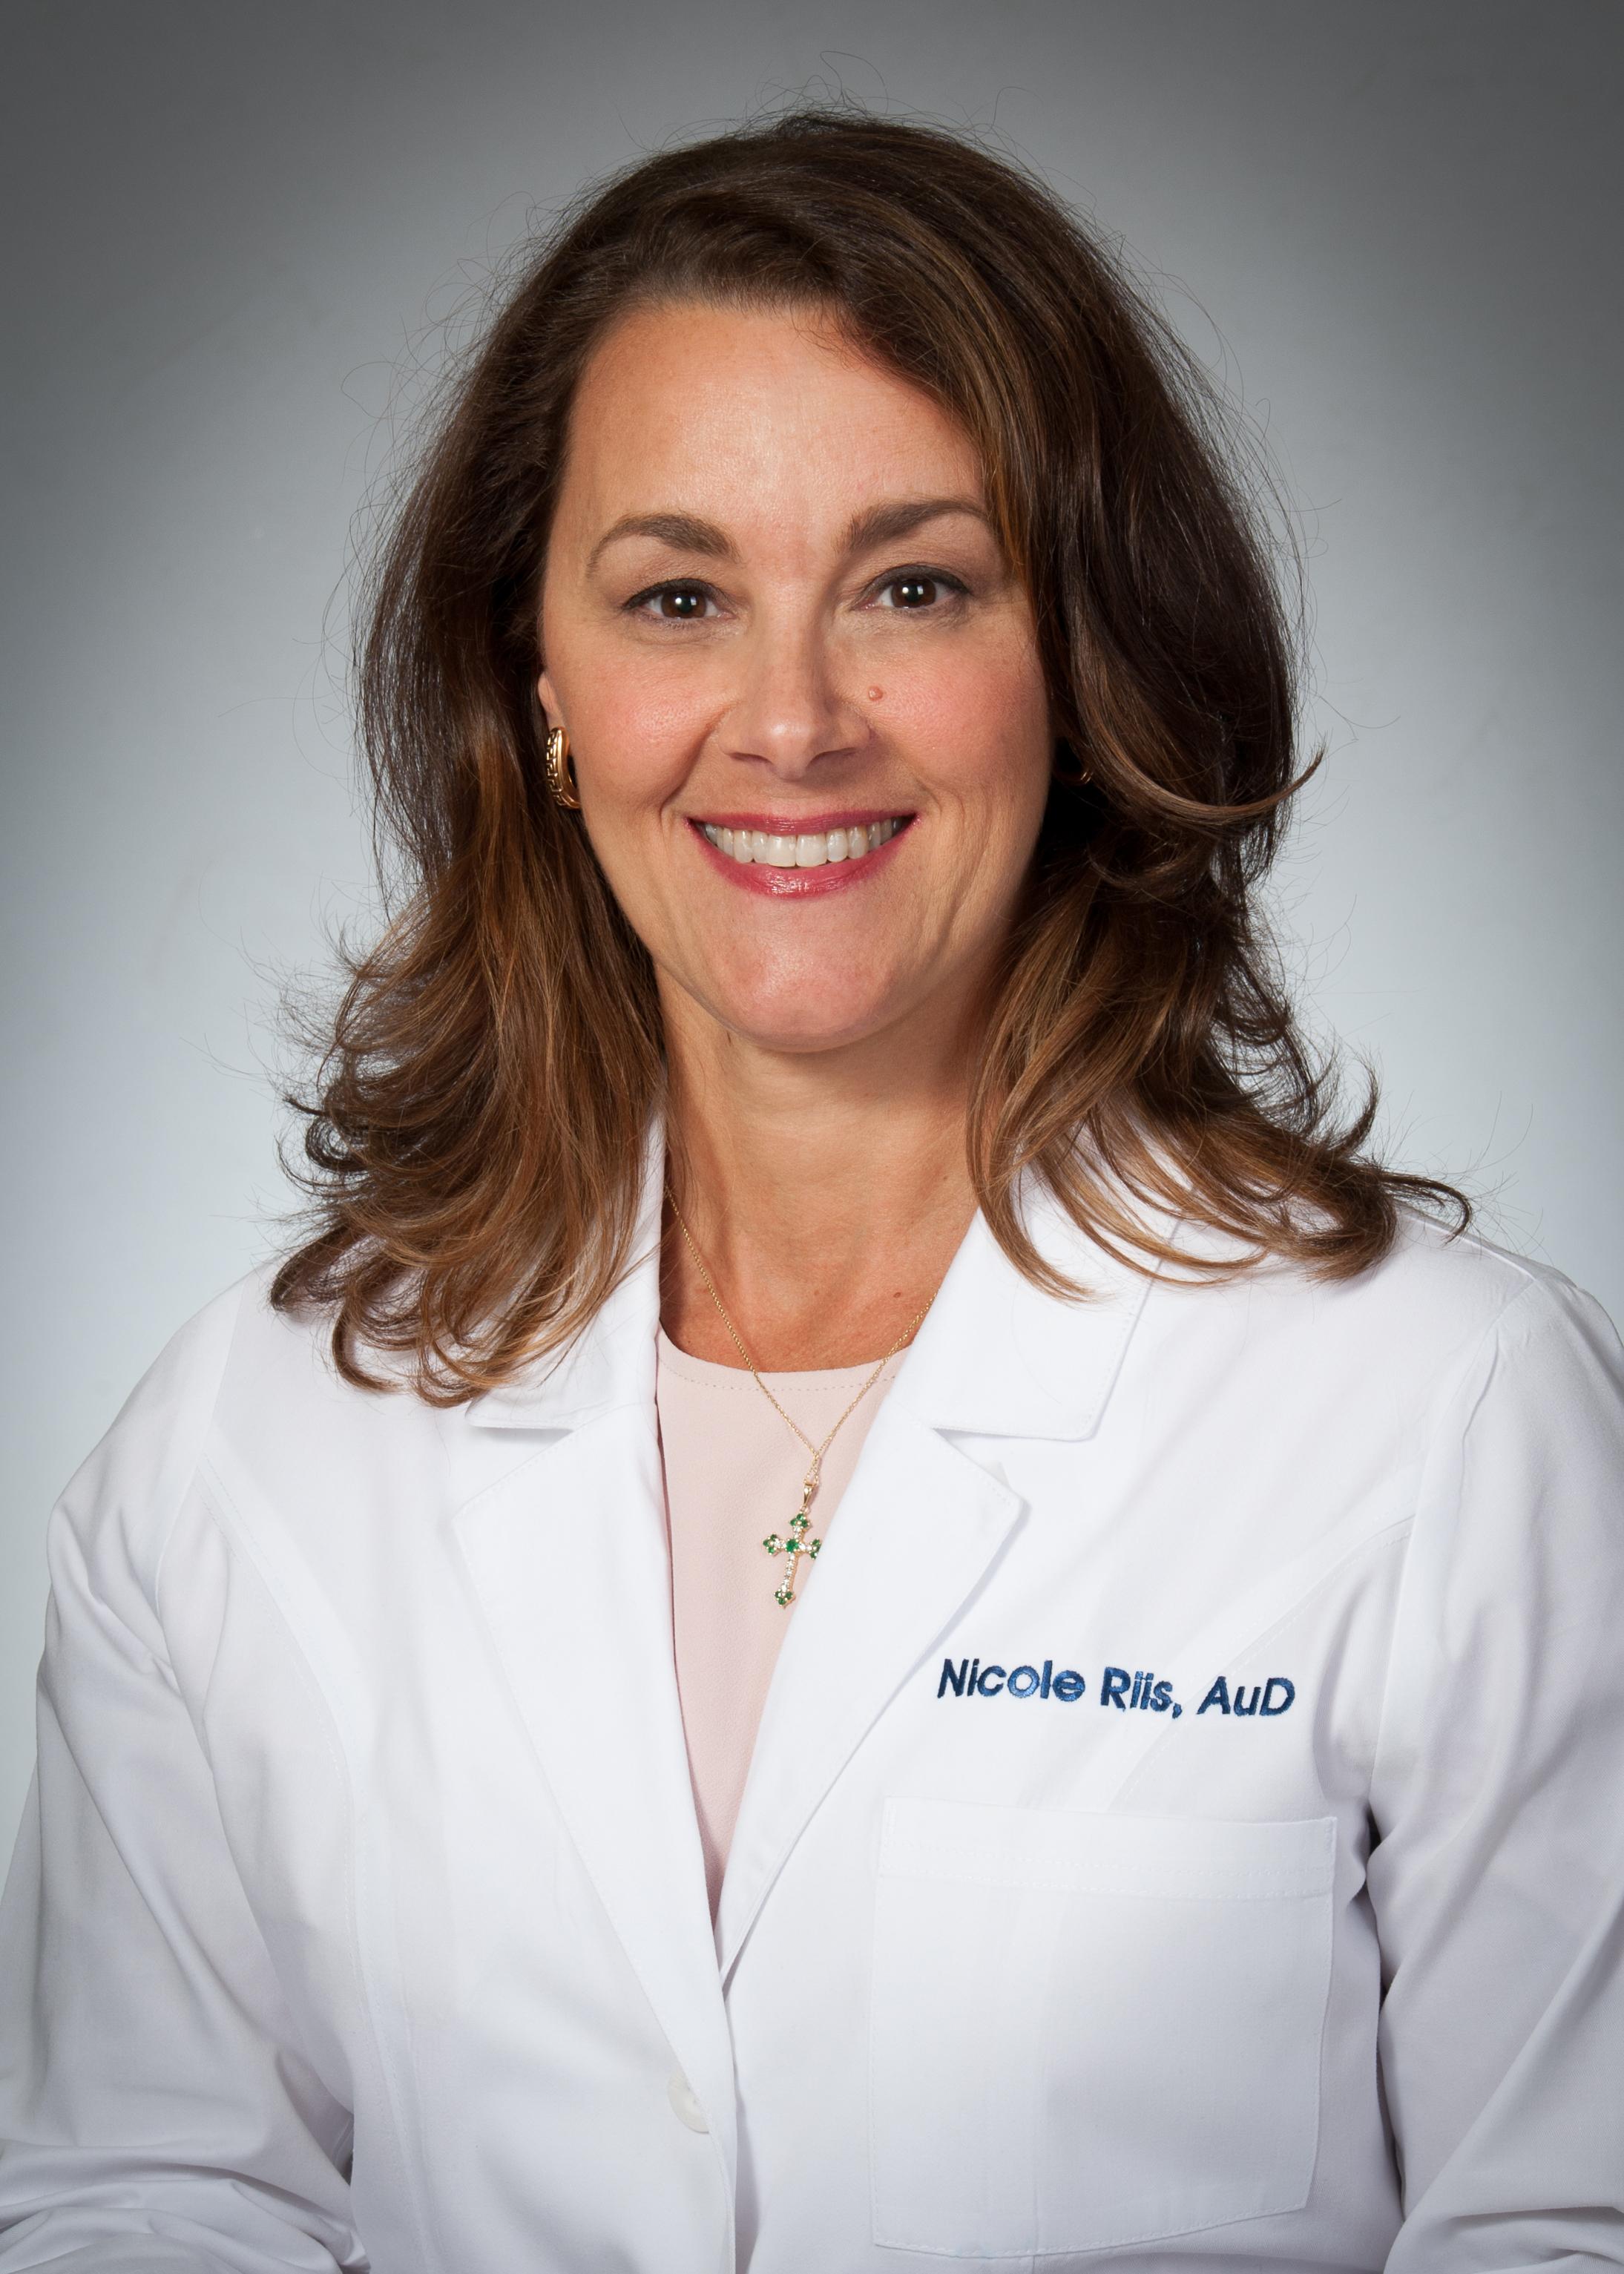 Nicole Riis, AuD headshot